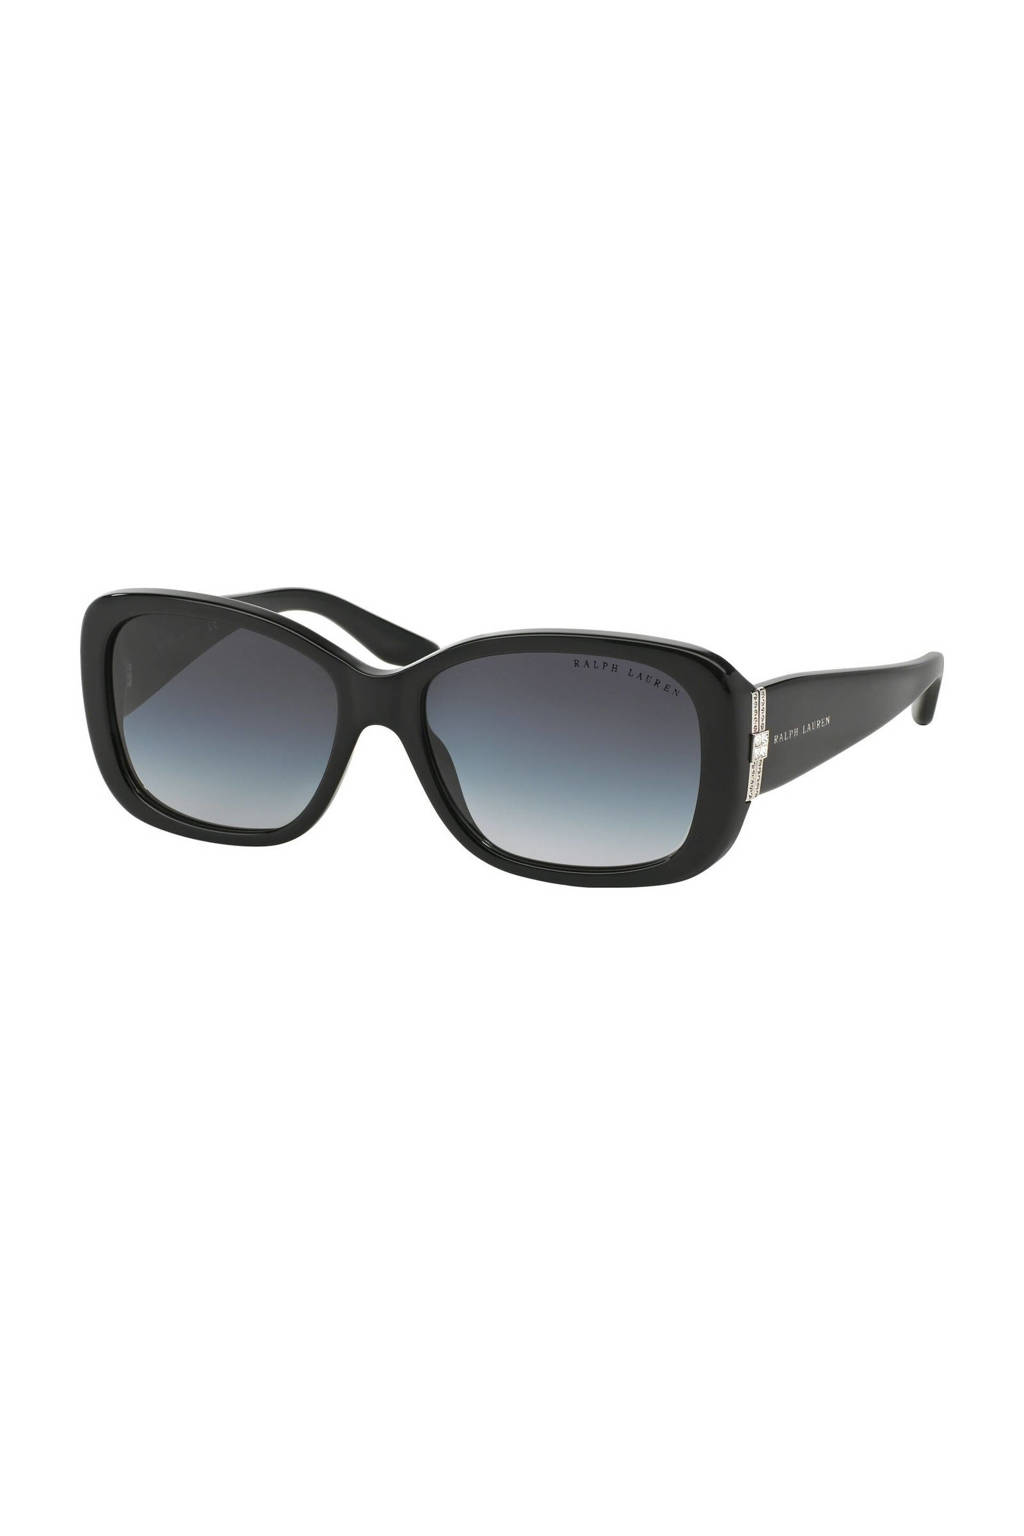 Ralph Lauren zonnebril 0RL8127B, Grijs